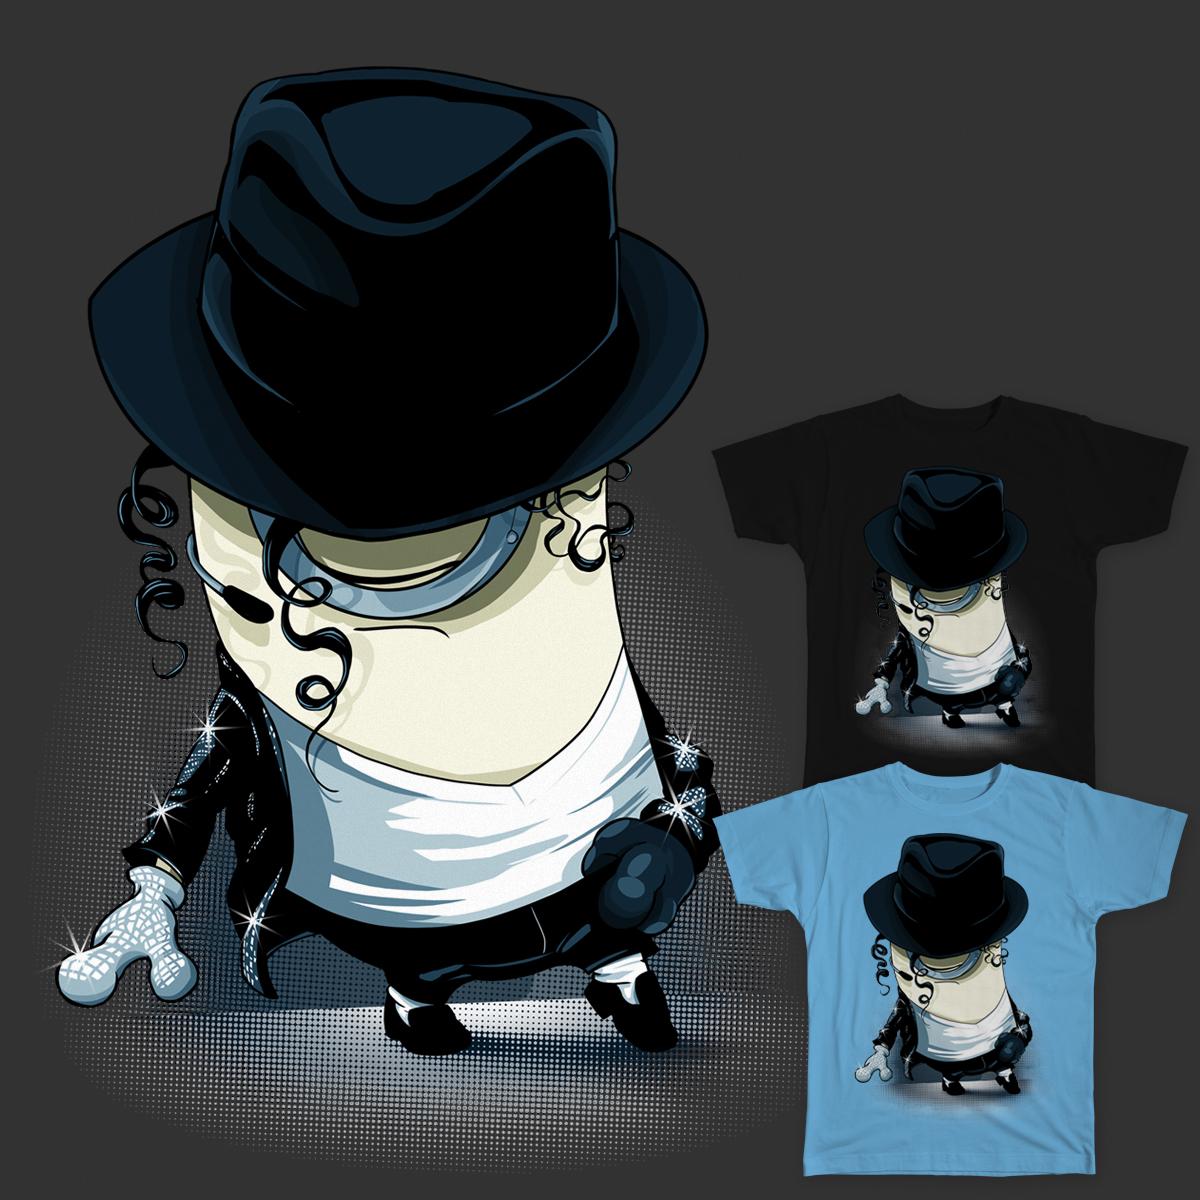 Minion Jackson by OKPDESIGN on Threadless